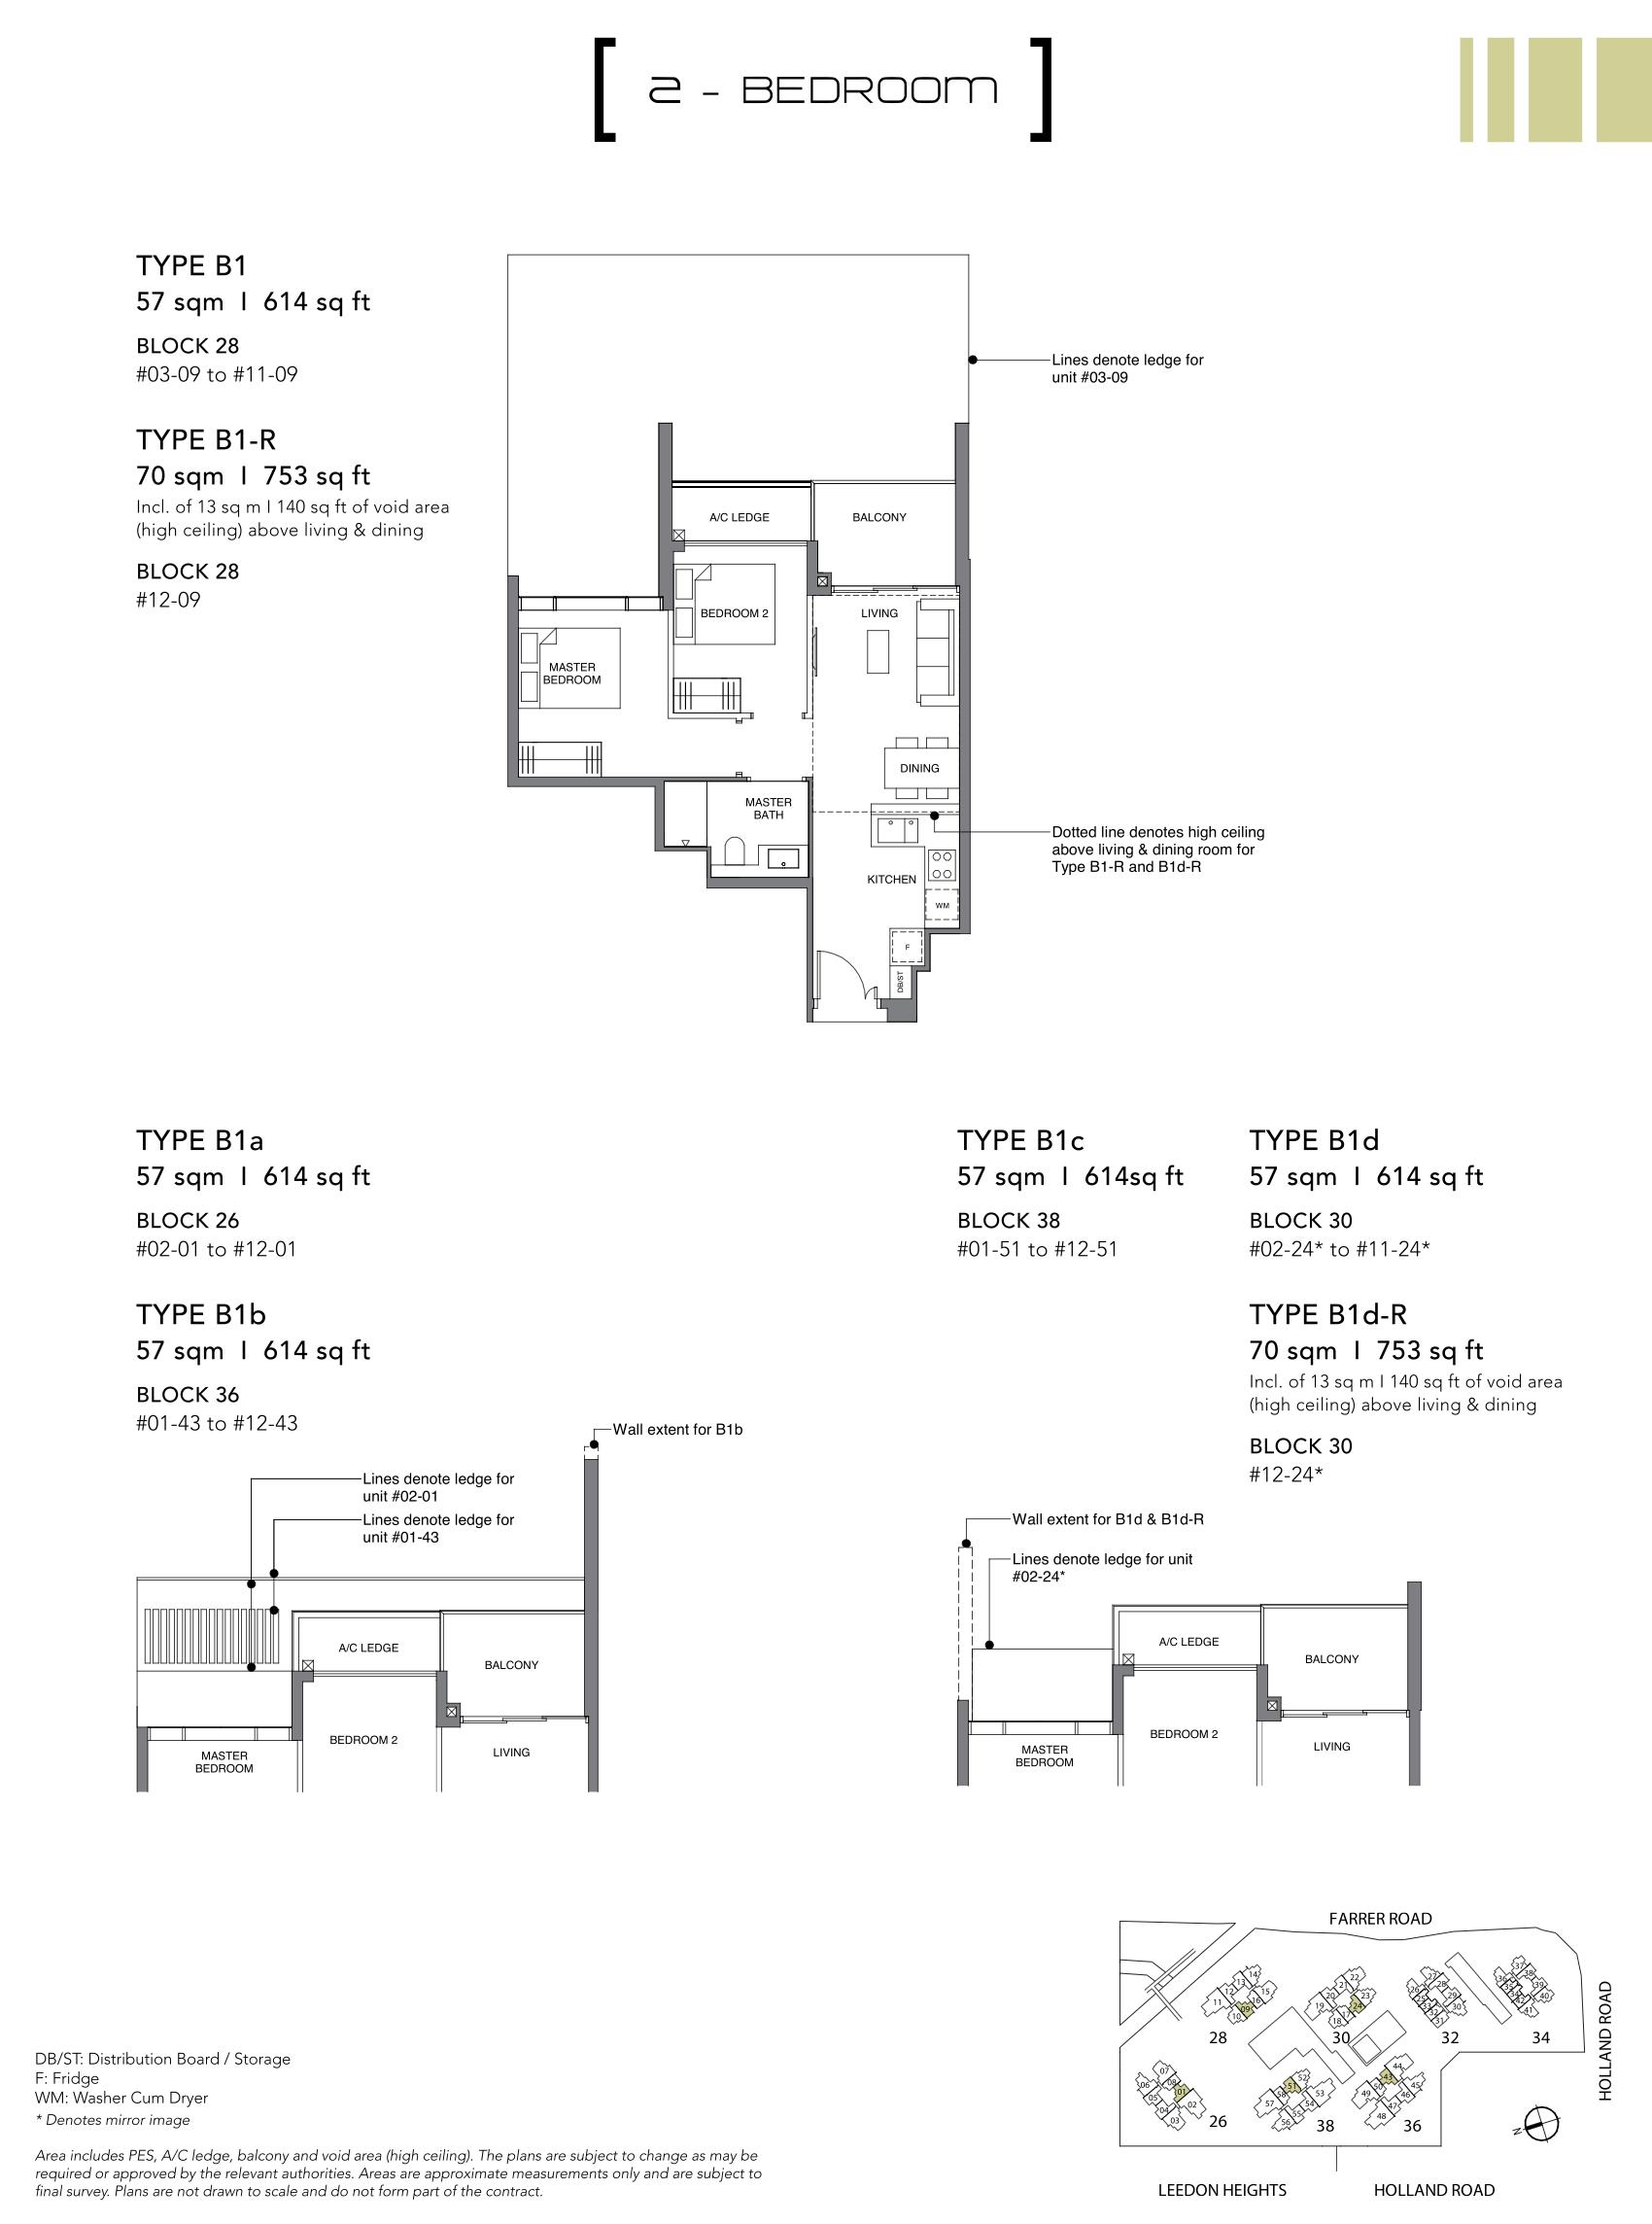 绿墩雅苑公寓户型图 Leedon Green floor plan 2 bedroom b1